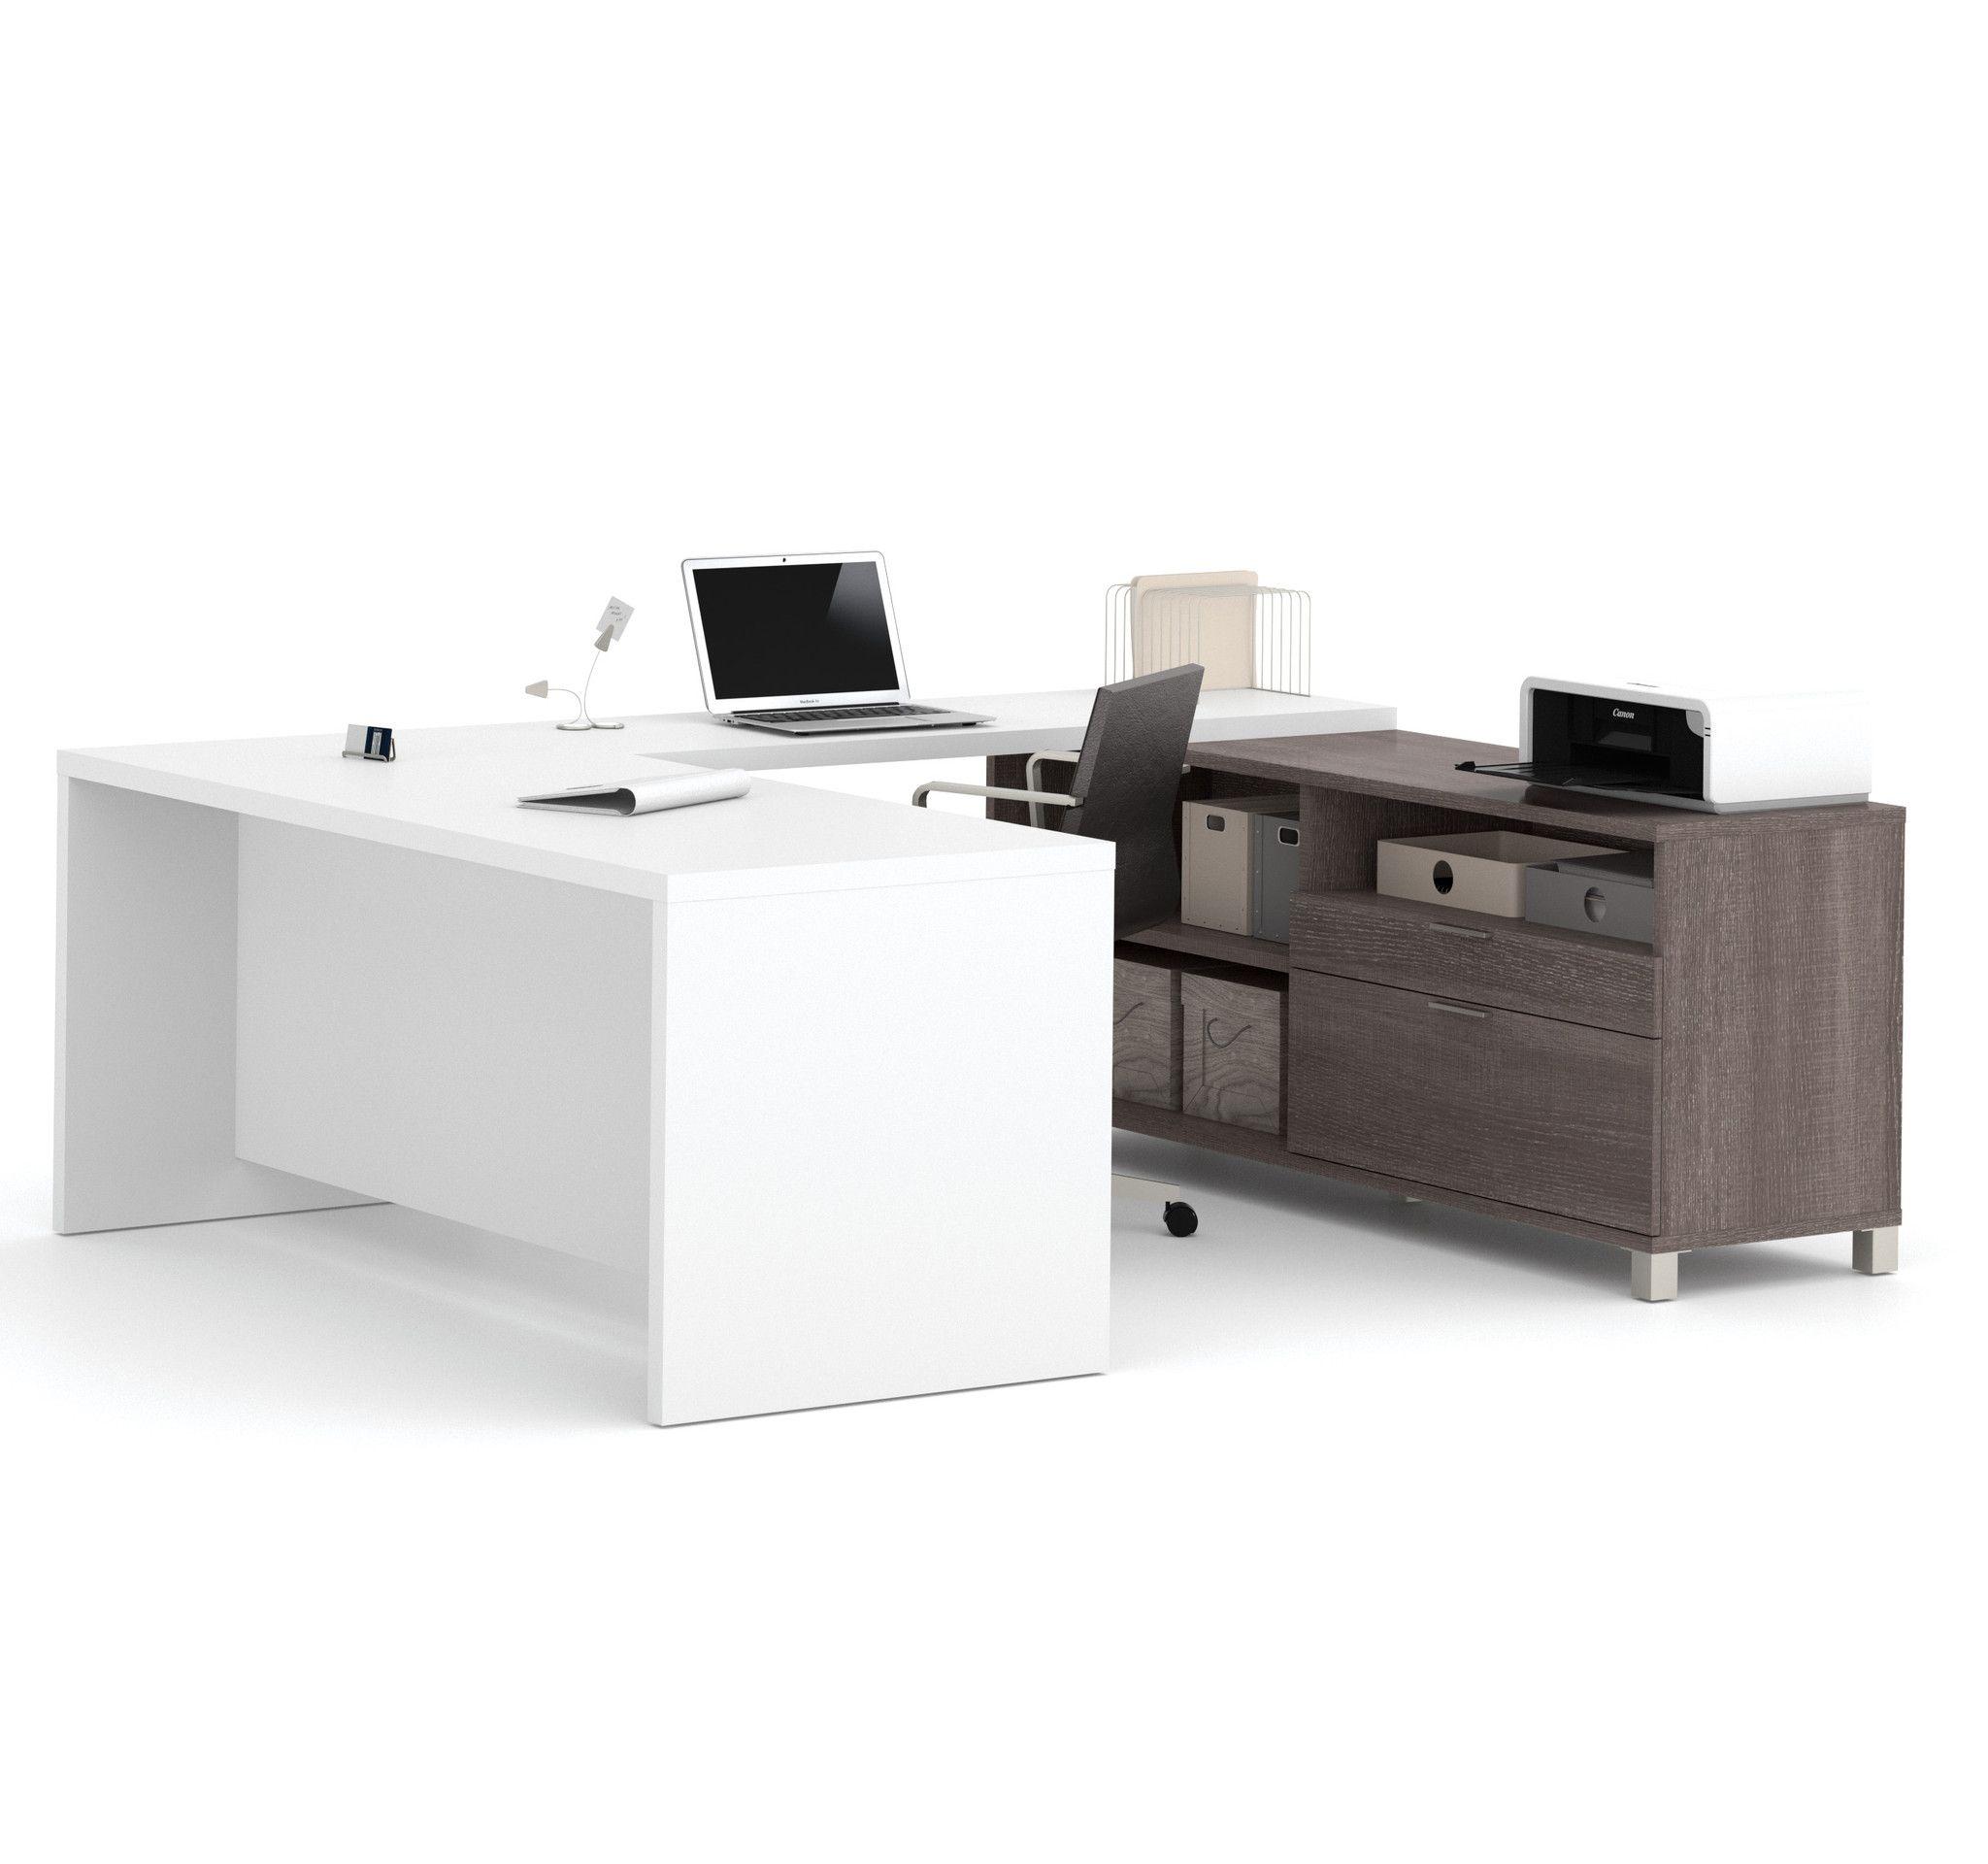 Premium Modern U-shaped Desk in White & Bark Gray | Barking F.C. ...